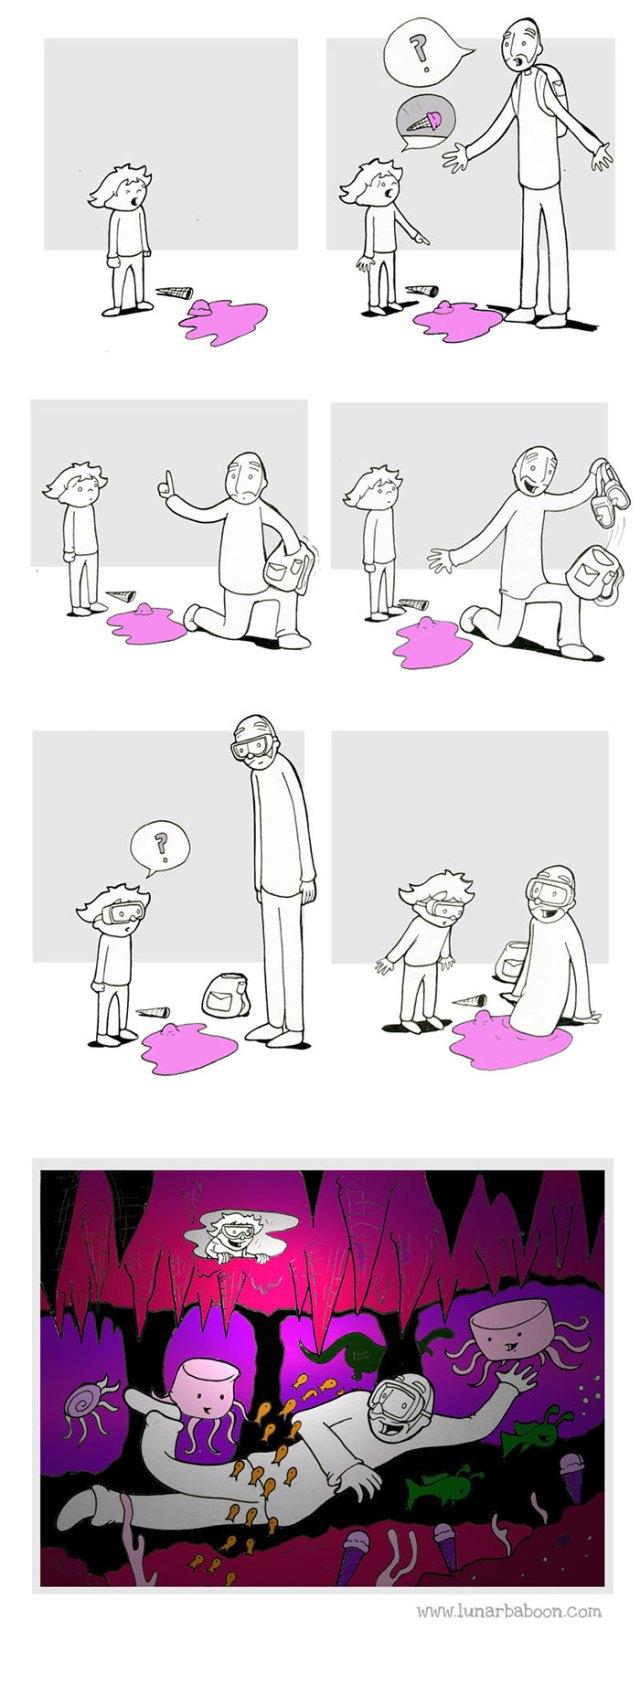 comics-padre-hijo-lunarbaboon- (6)